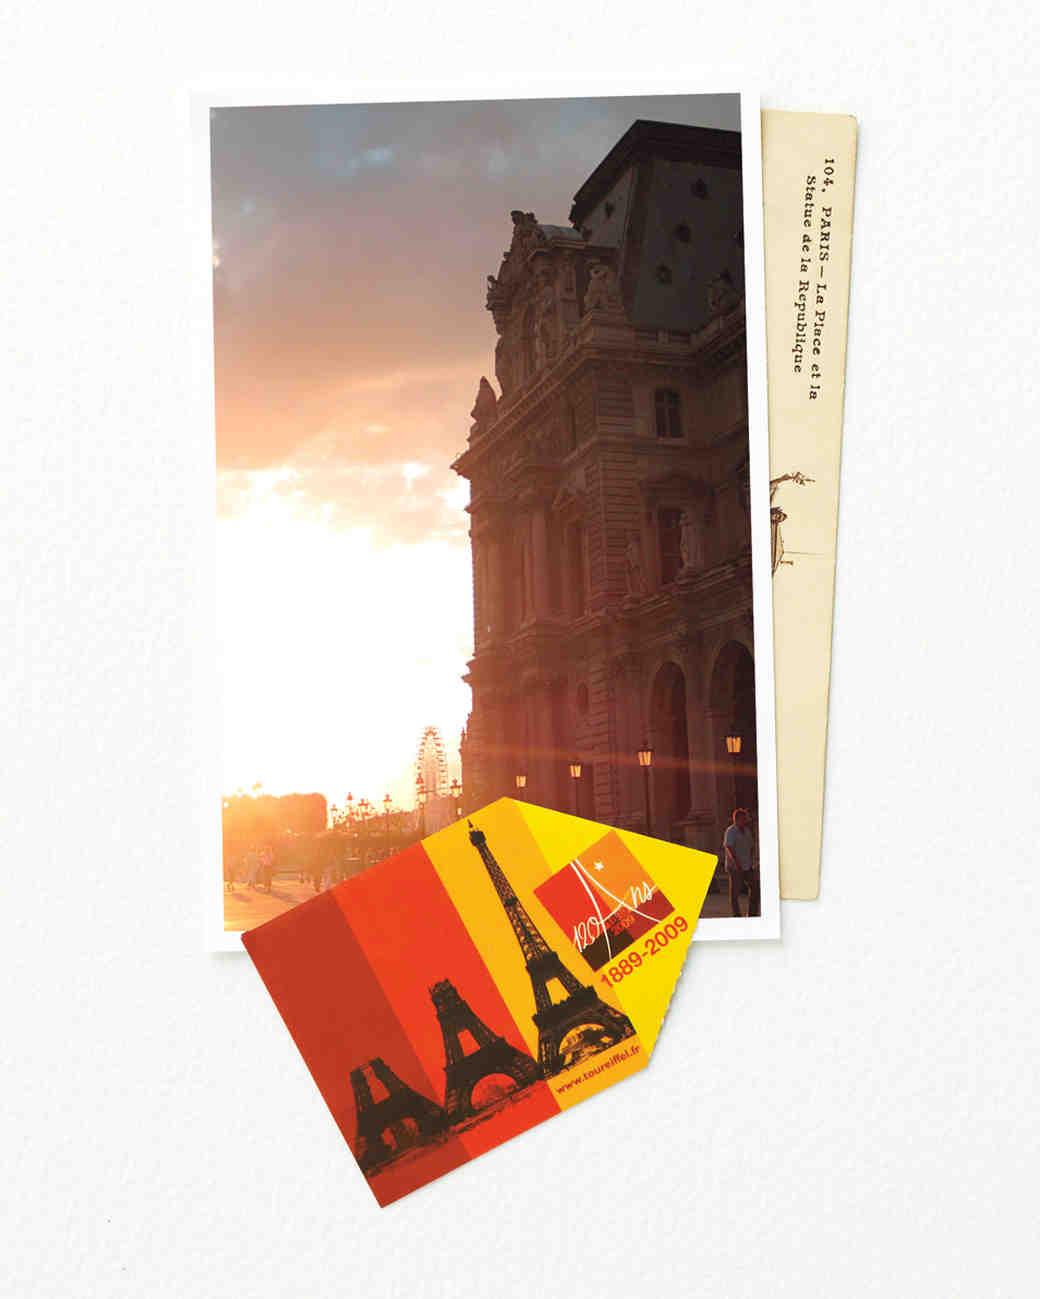 honeymoon-paris-2-mwd107758.jpg